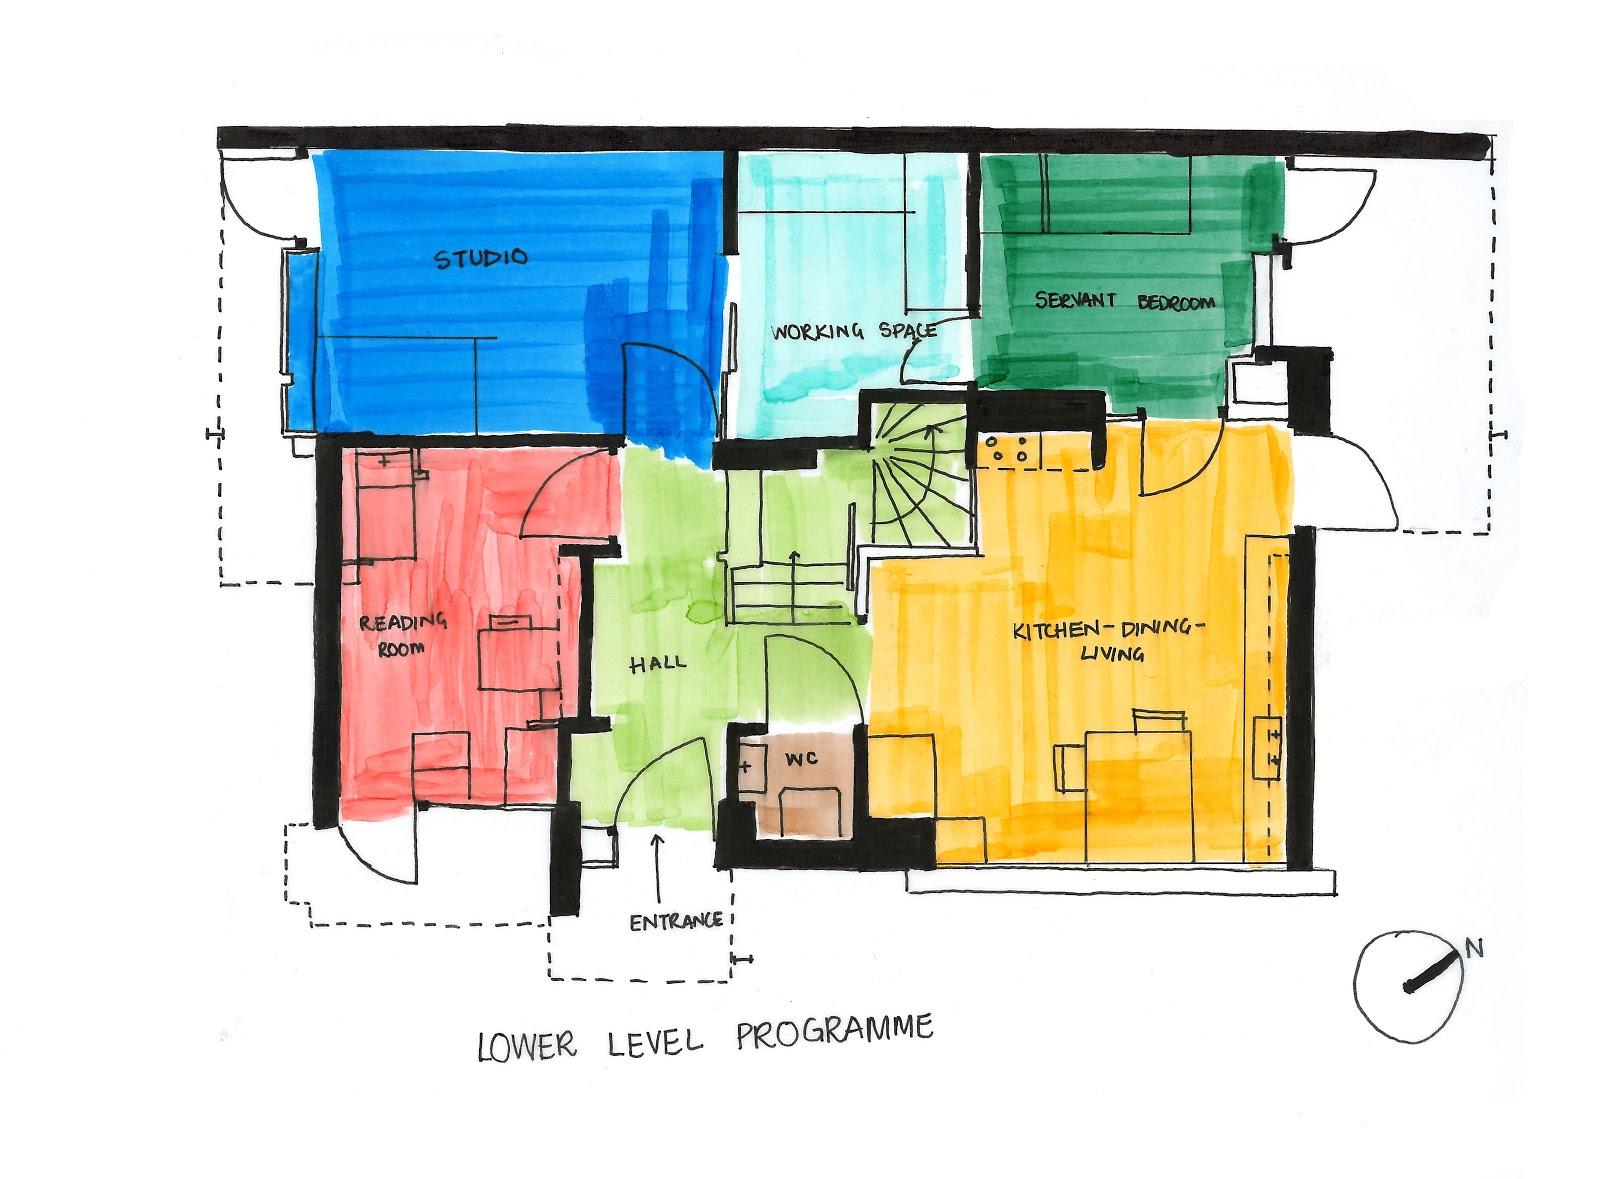 Villa Savoye Floor Plans The Rietveld Schroder House Diagrams An In Depth